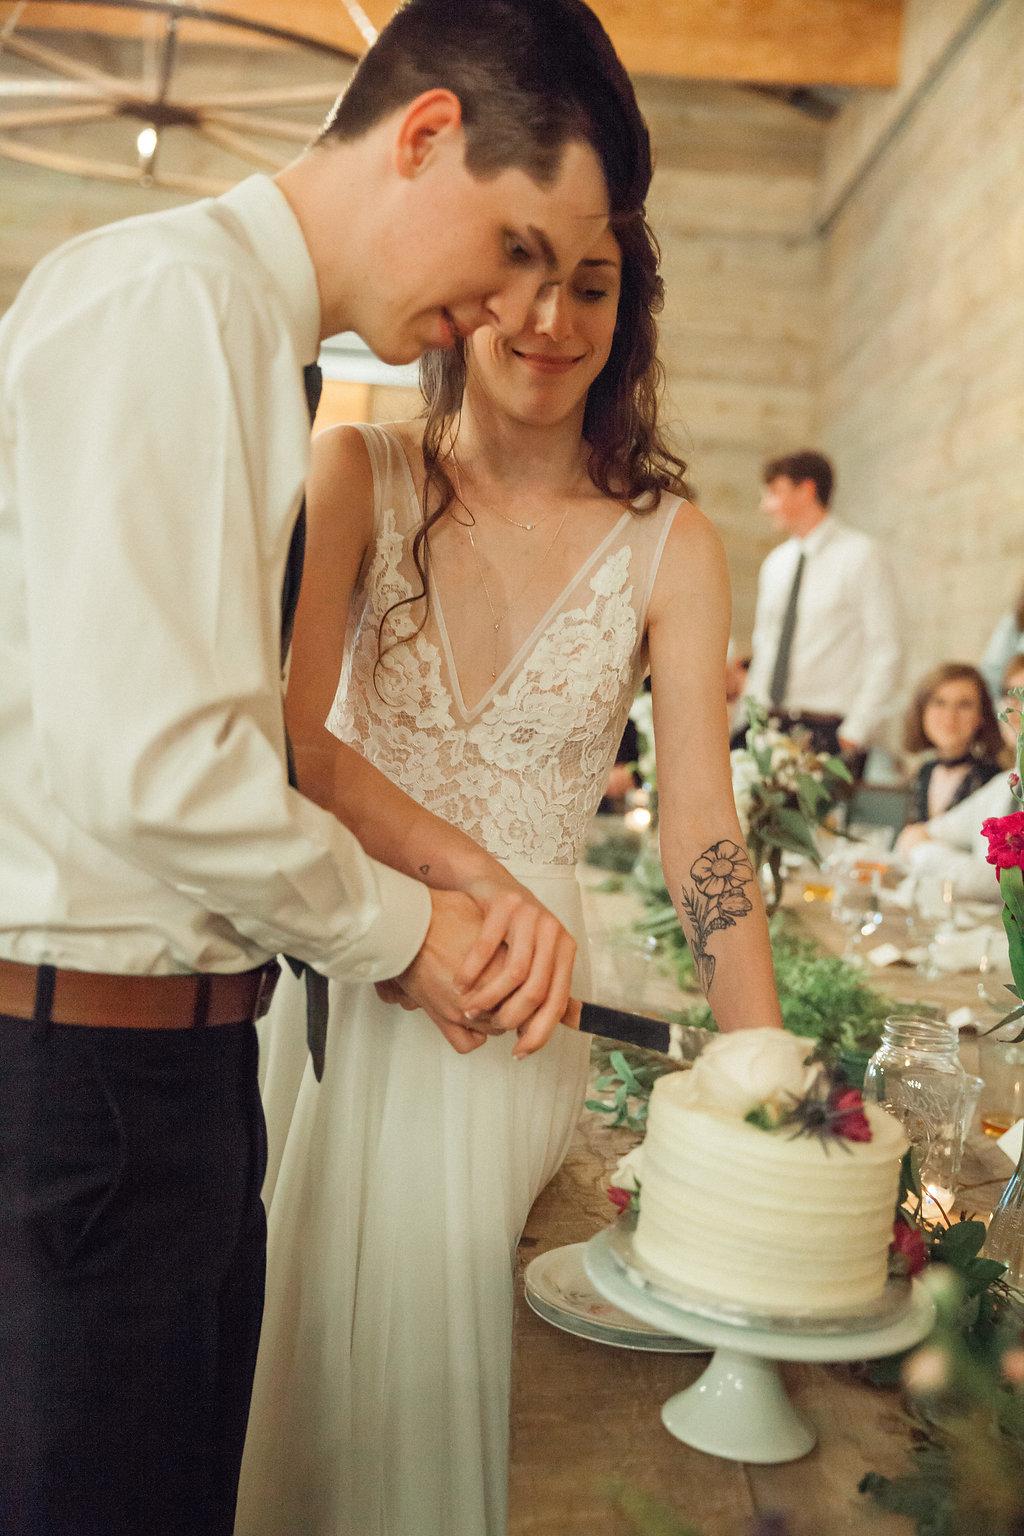 Honeysuckle-Hill-Weddings-Mallory-Patrick-113.jpg